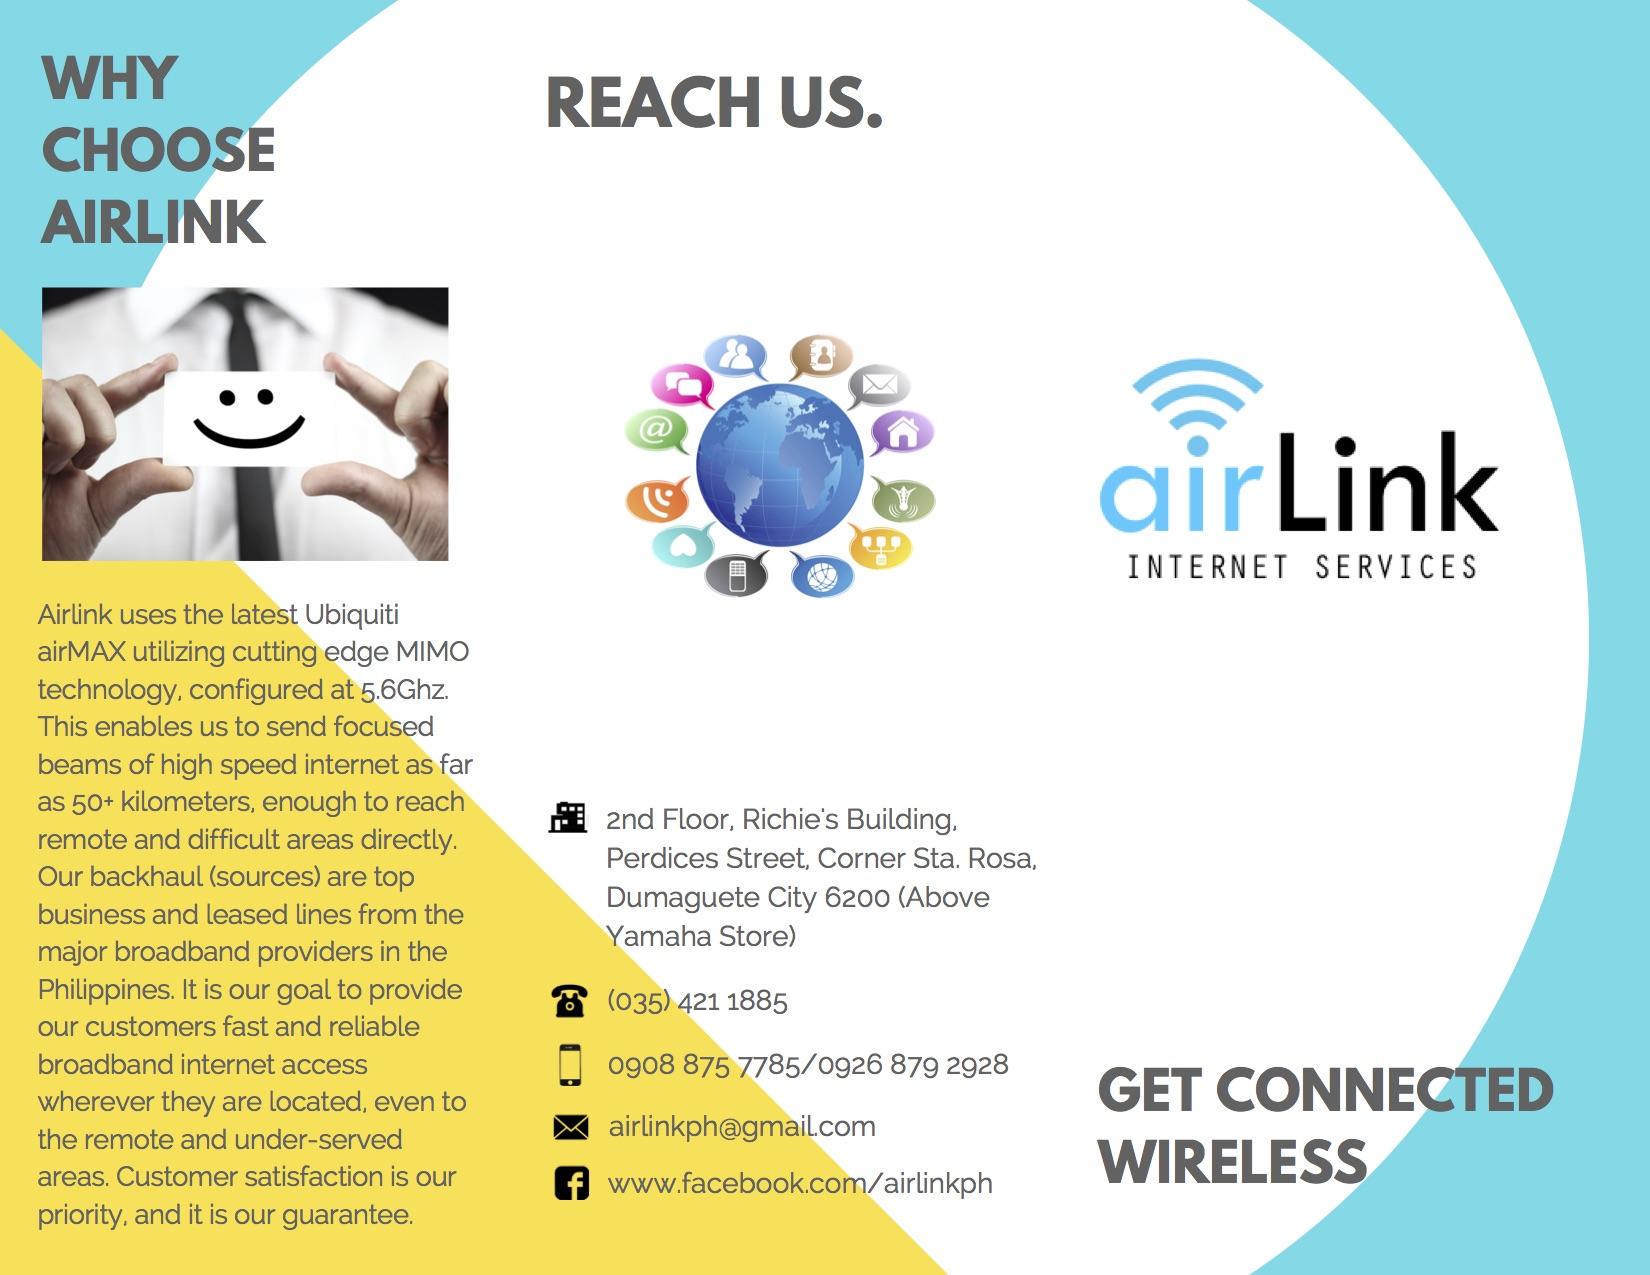 AirLink Internet Services | DumagueteInfo Reviews